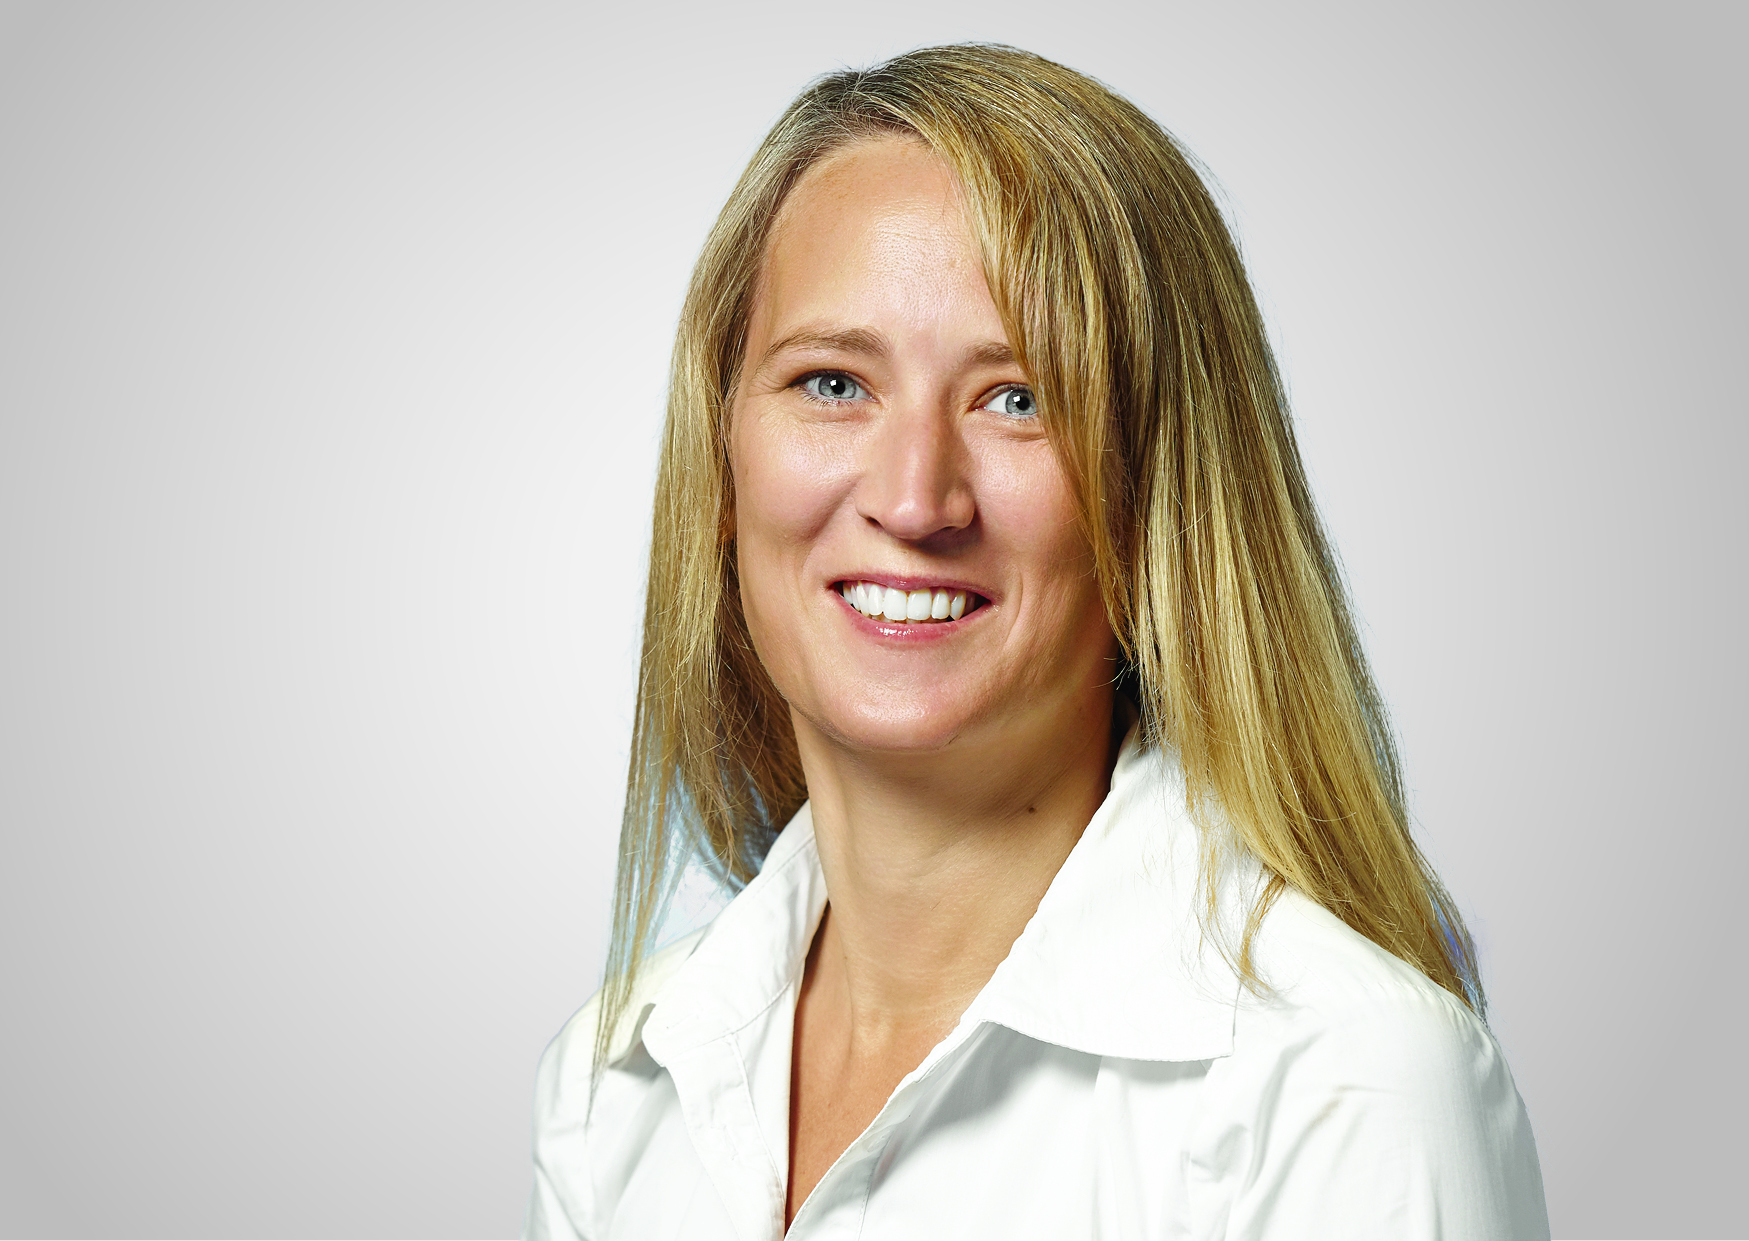 Claudia Hilkenbach